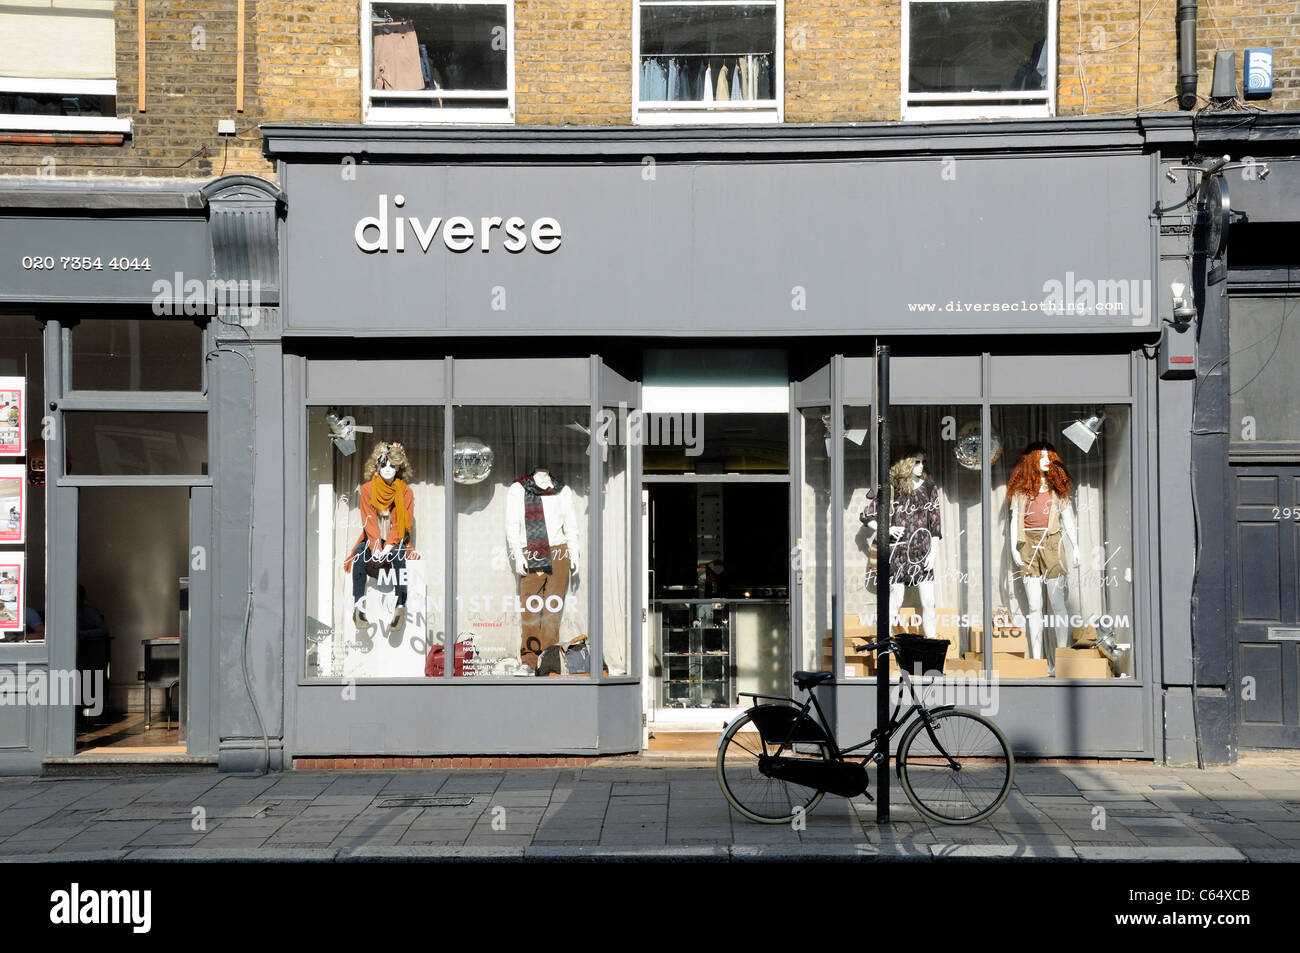 Diverse clothes shop Upper Street Islington London England UK - Stock Image